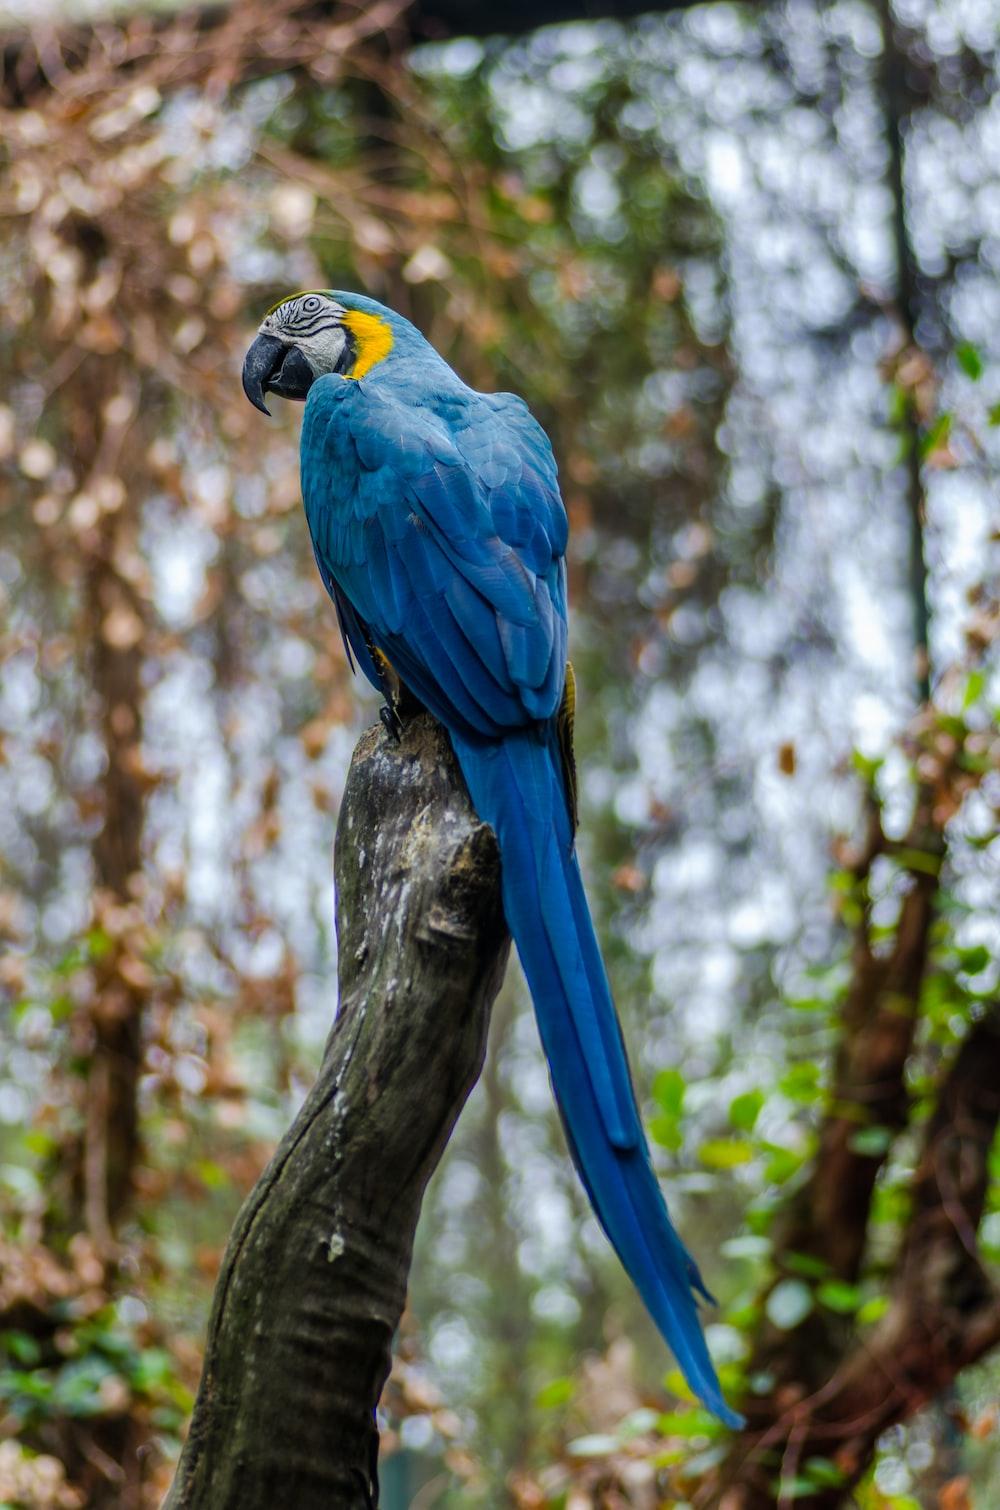 bokeh shot of blue and yellow bird